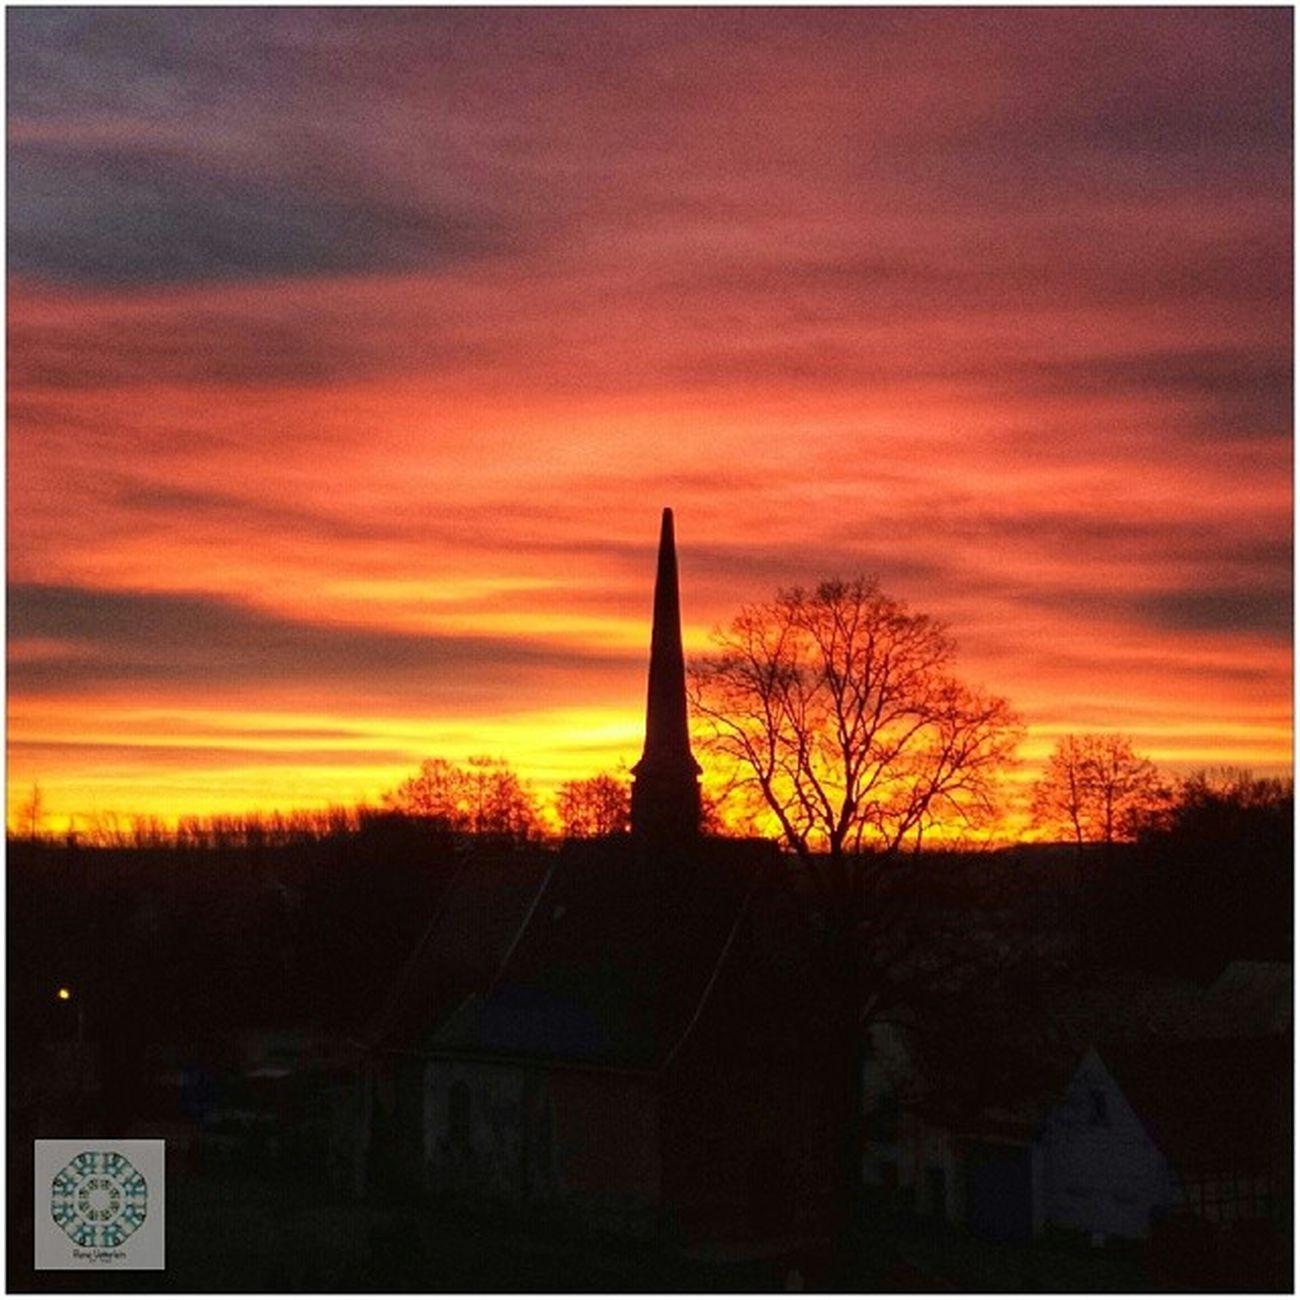 I wish my friends a wonderful day. Soellmnitz S öllmnitz Gera Thuringia hometown germany morning sunrise beautiful color